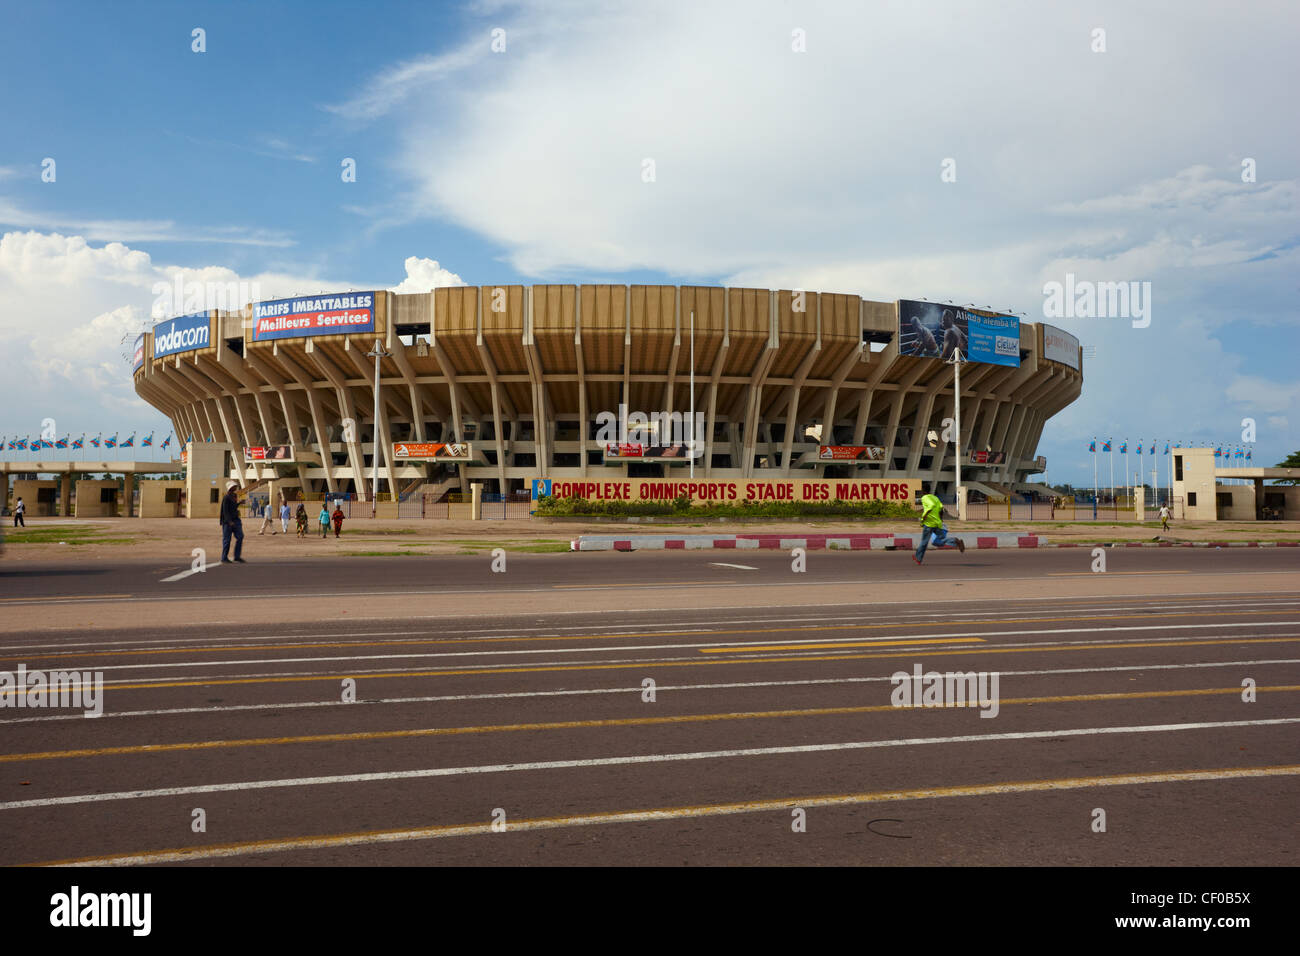 Stade des Martyrs, Kinshasa, Democratic Republic of Congo, Africa - Stock Image